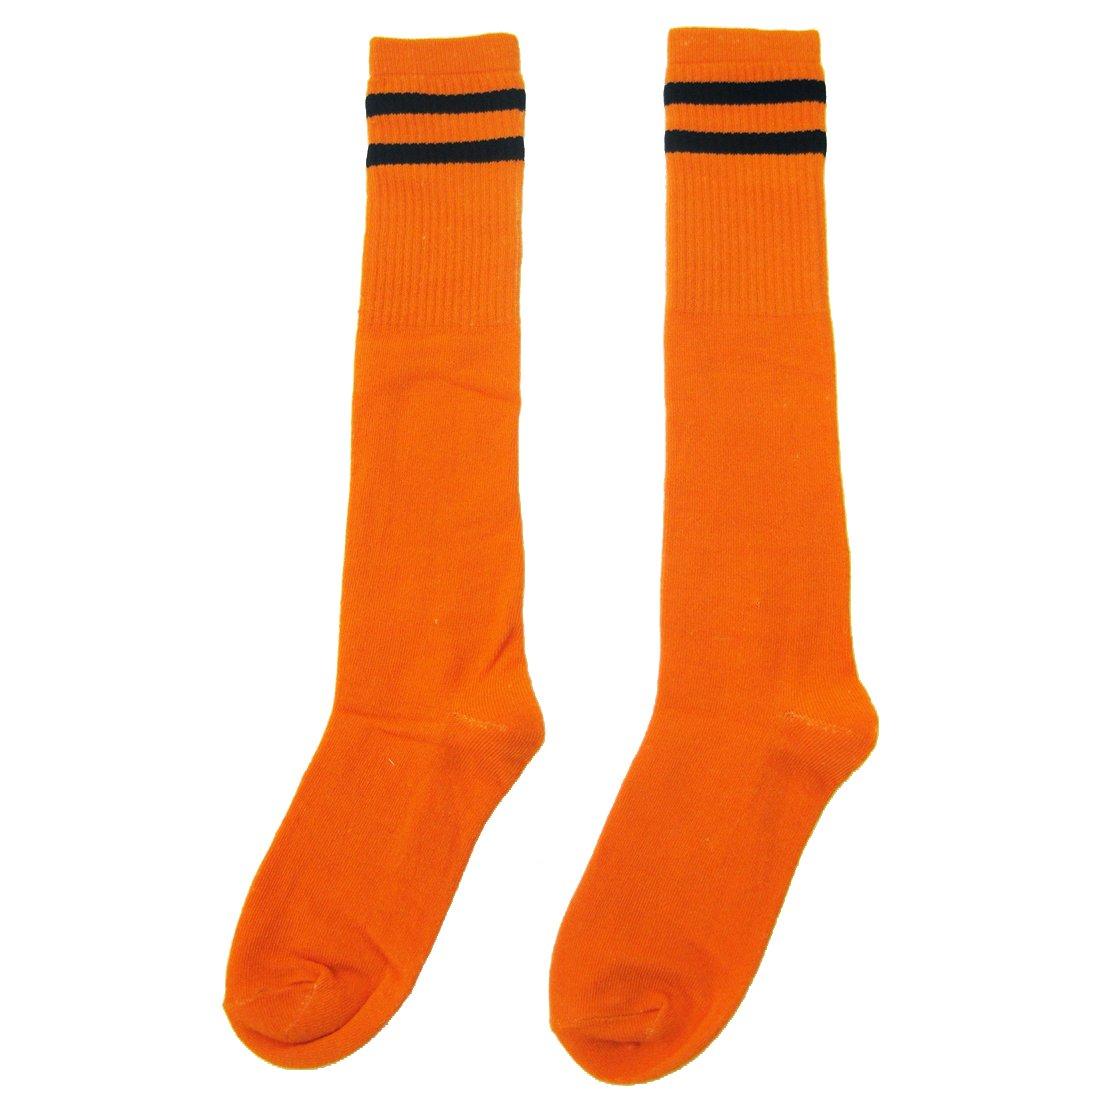 Ninos calcetines largos - SODIAL(R)Ninos Ninos Deporte Futbol calcetines largos de alta calcetin Beisbol Hockey Calcetines (naranja)